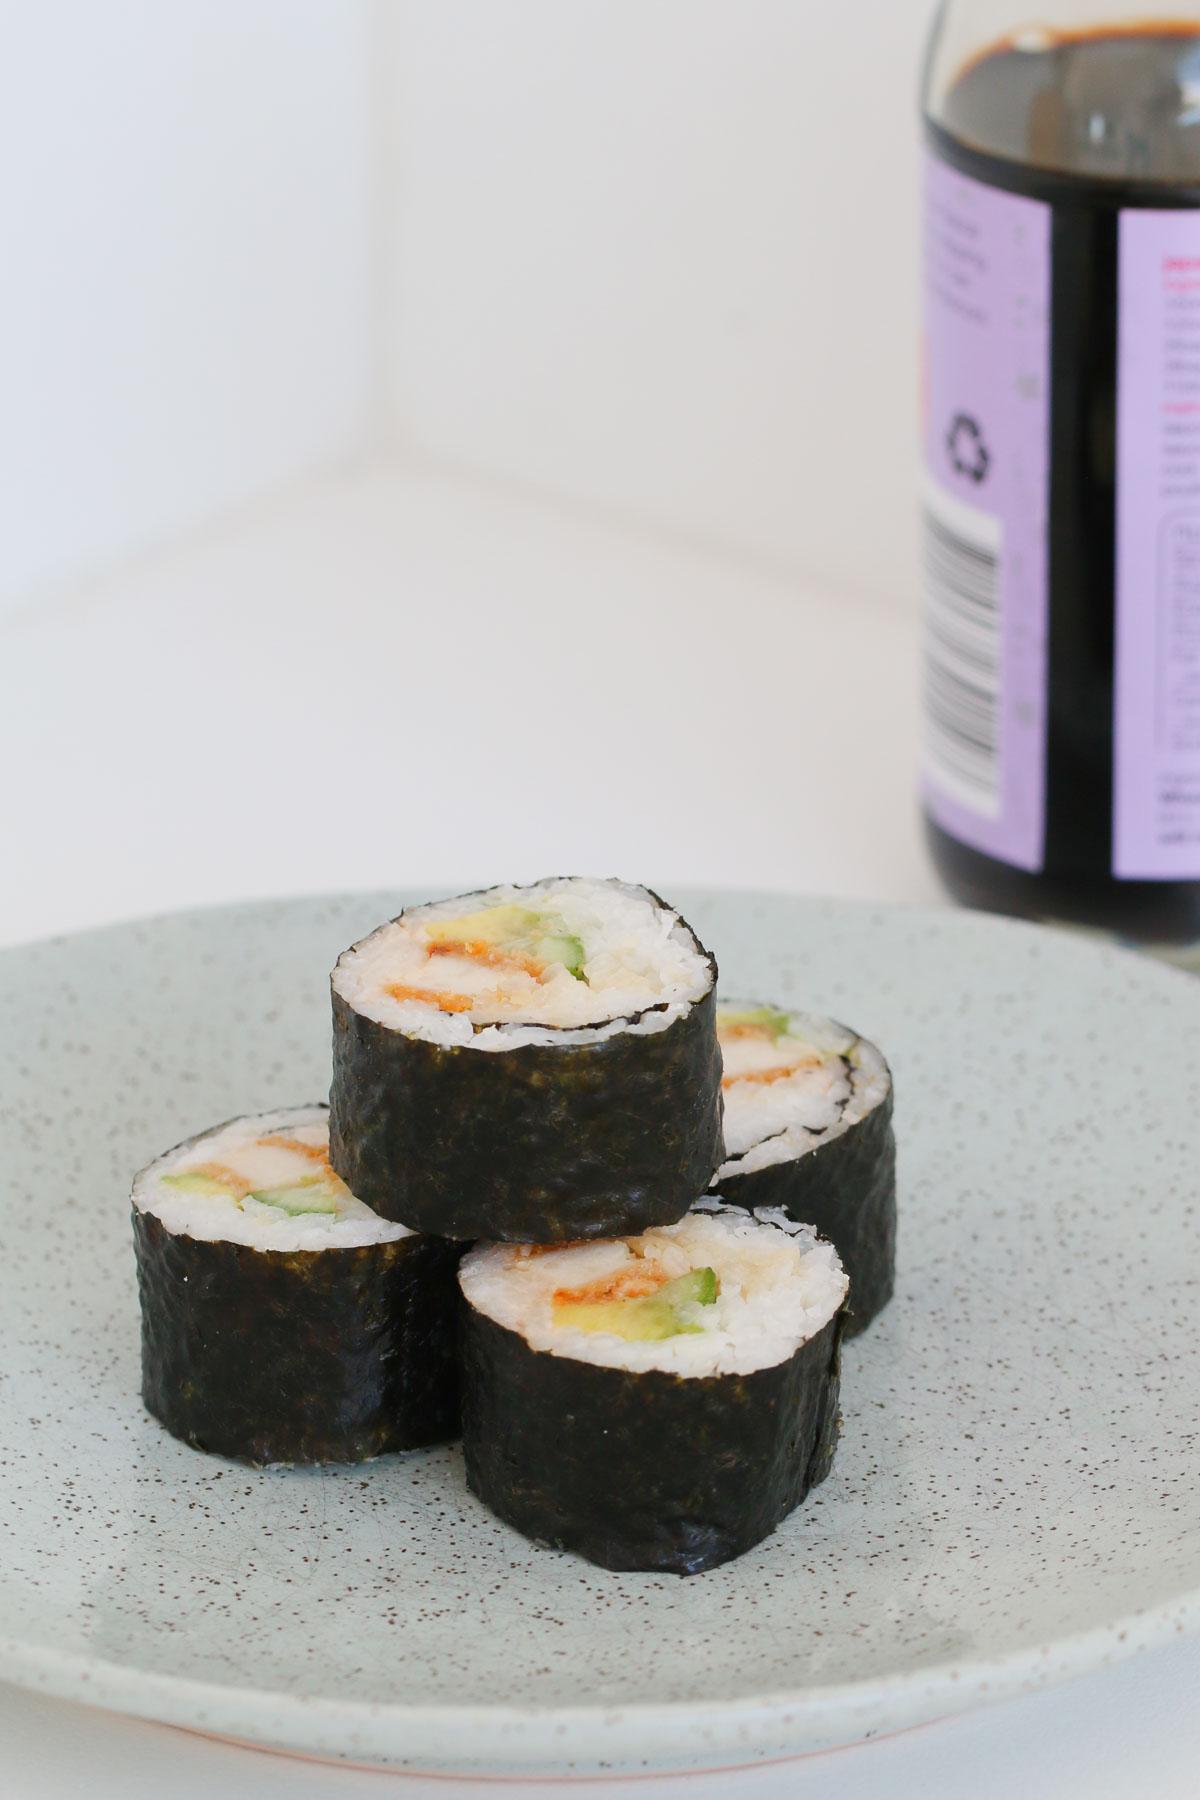 Sushi Thermomix casero con una botella de salsa de soja de fondo.